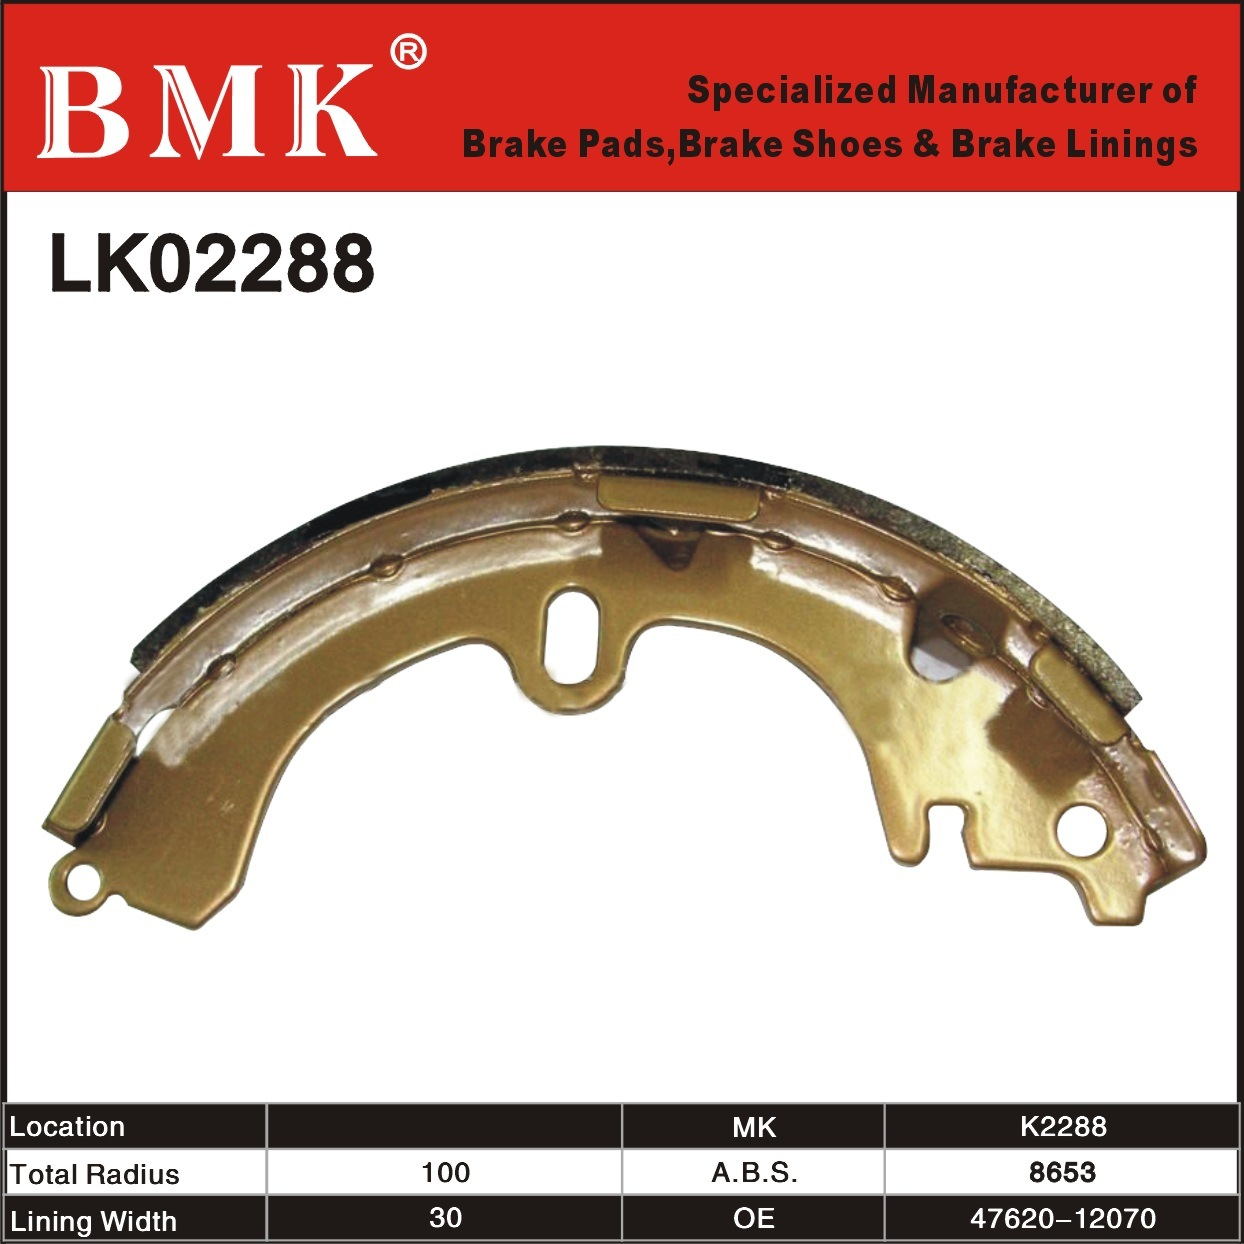 Advanced Quality Brake Shoes (K2288)